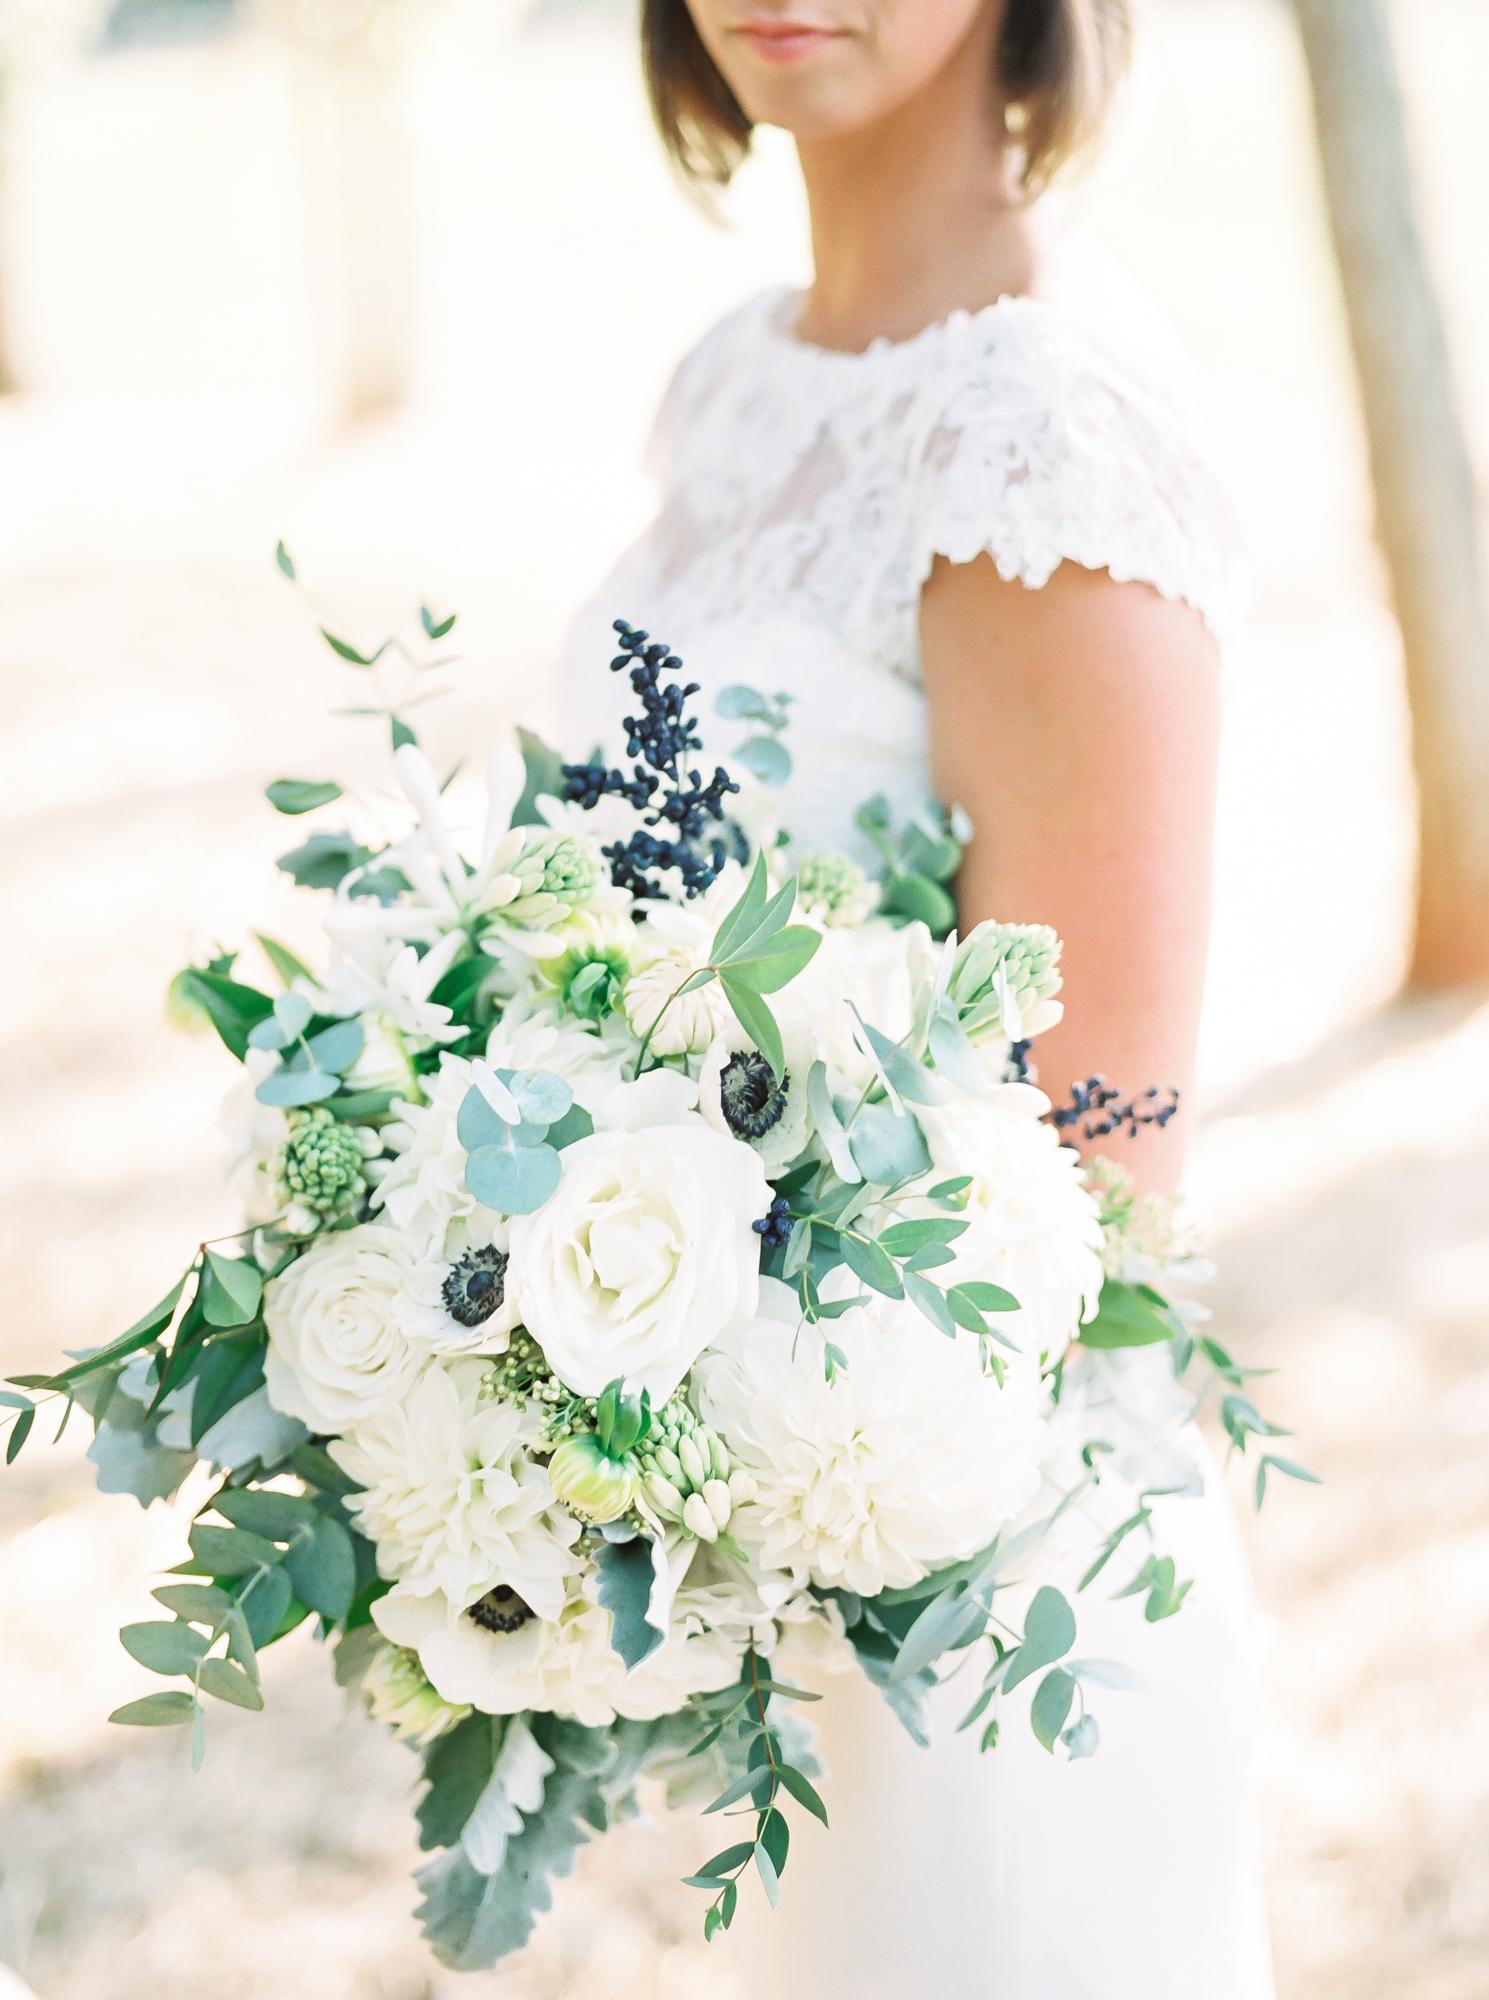 Flower bouquet with light colors